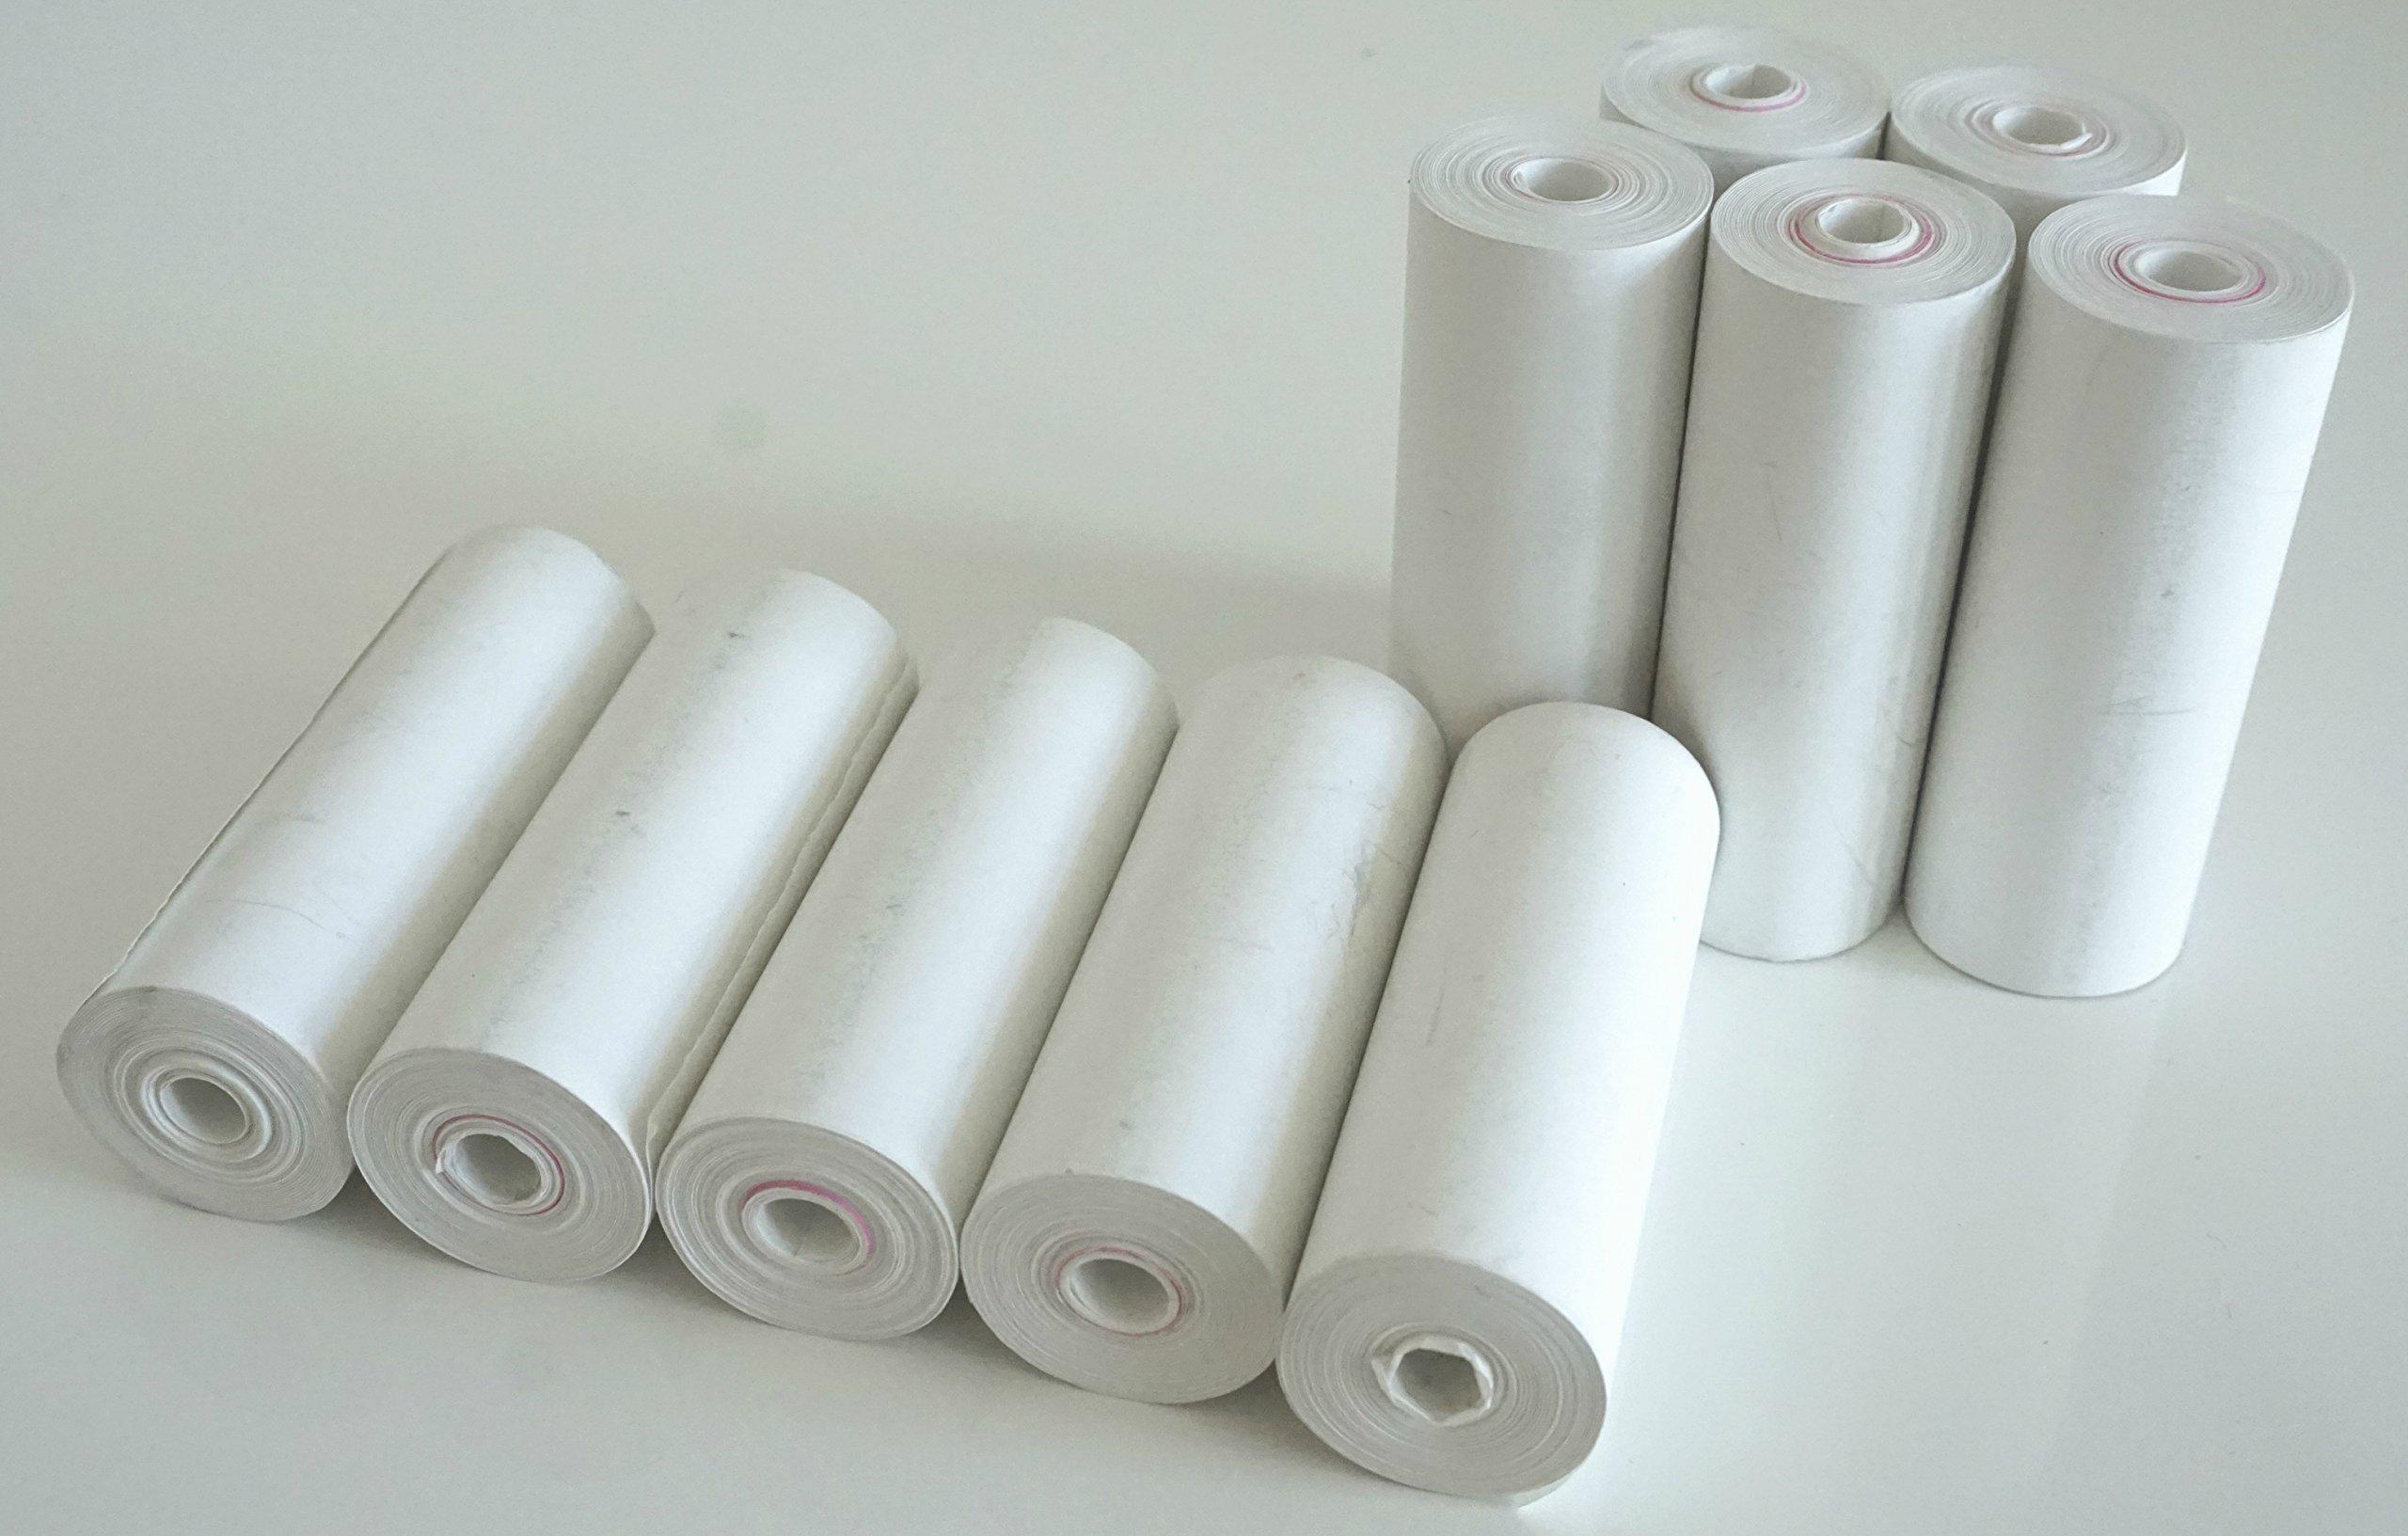 25 Coreless Thermal Paper Rolls for Poynt Smart Payment Terminal Receipt Printer - 2.25'' x 16' ea